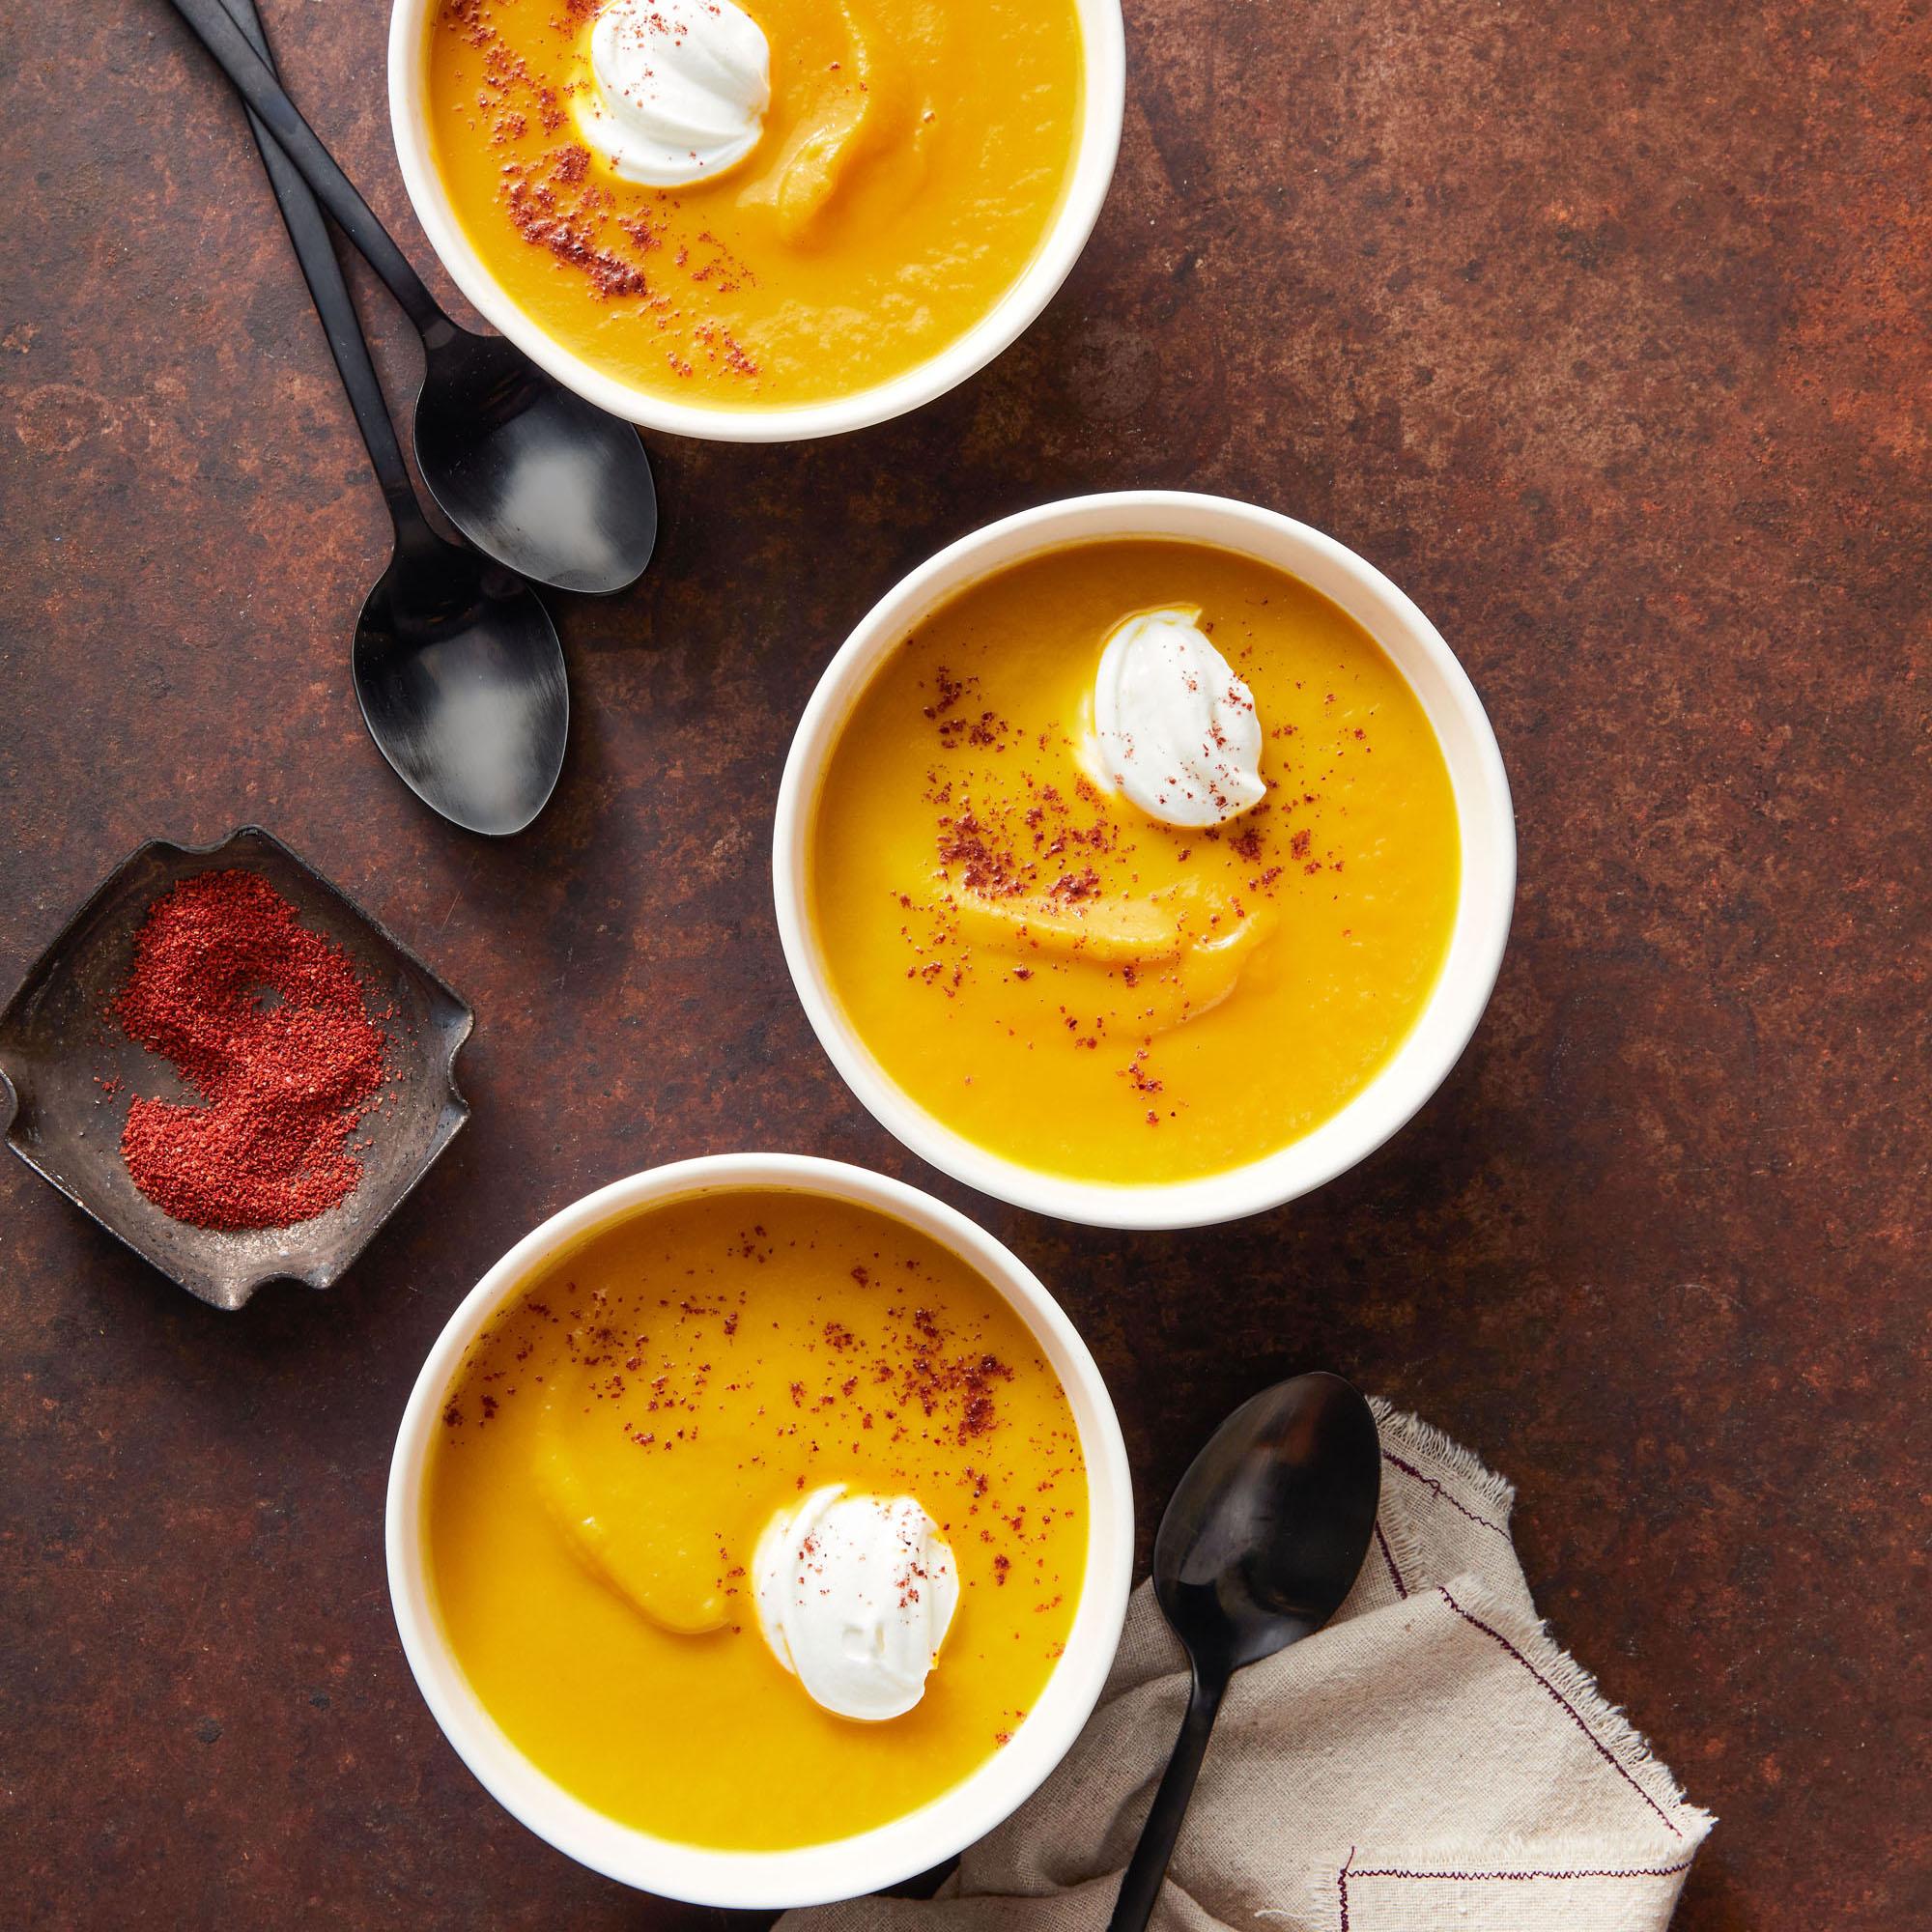 Carrot & Sunchoke Soup in three white bowls